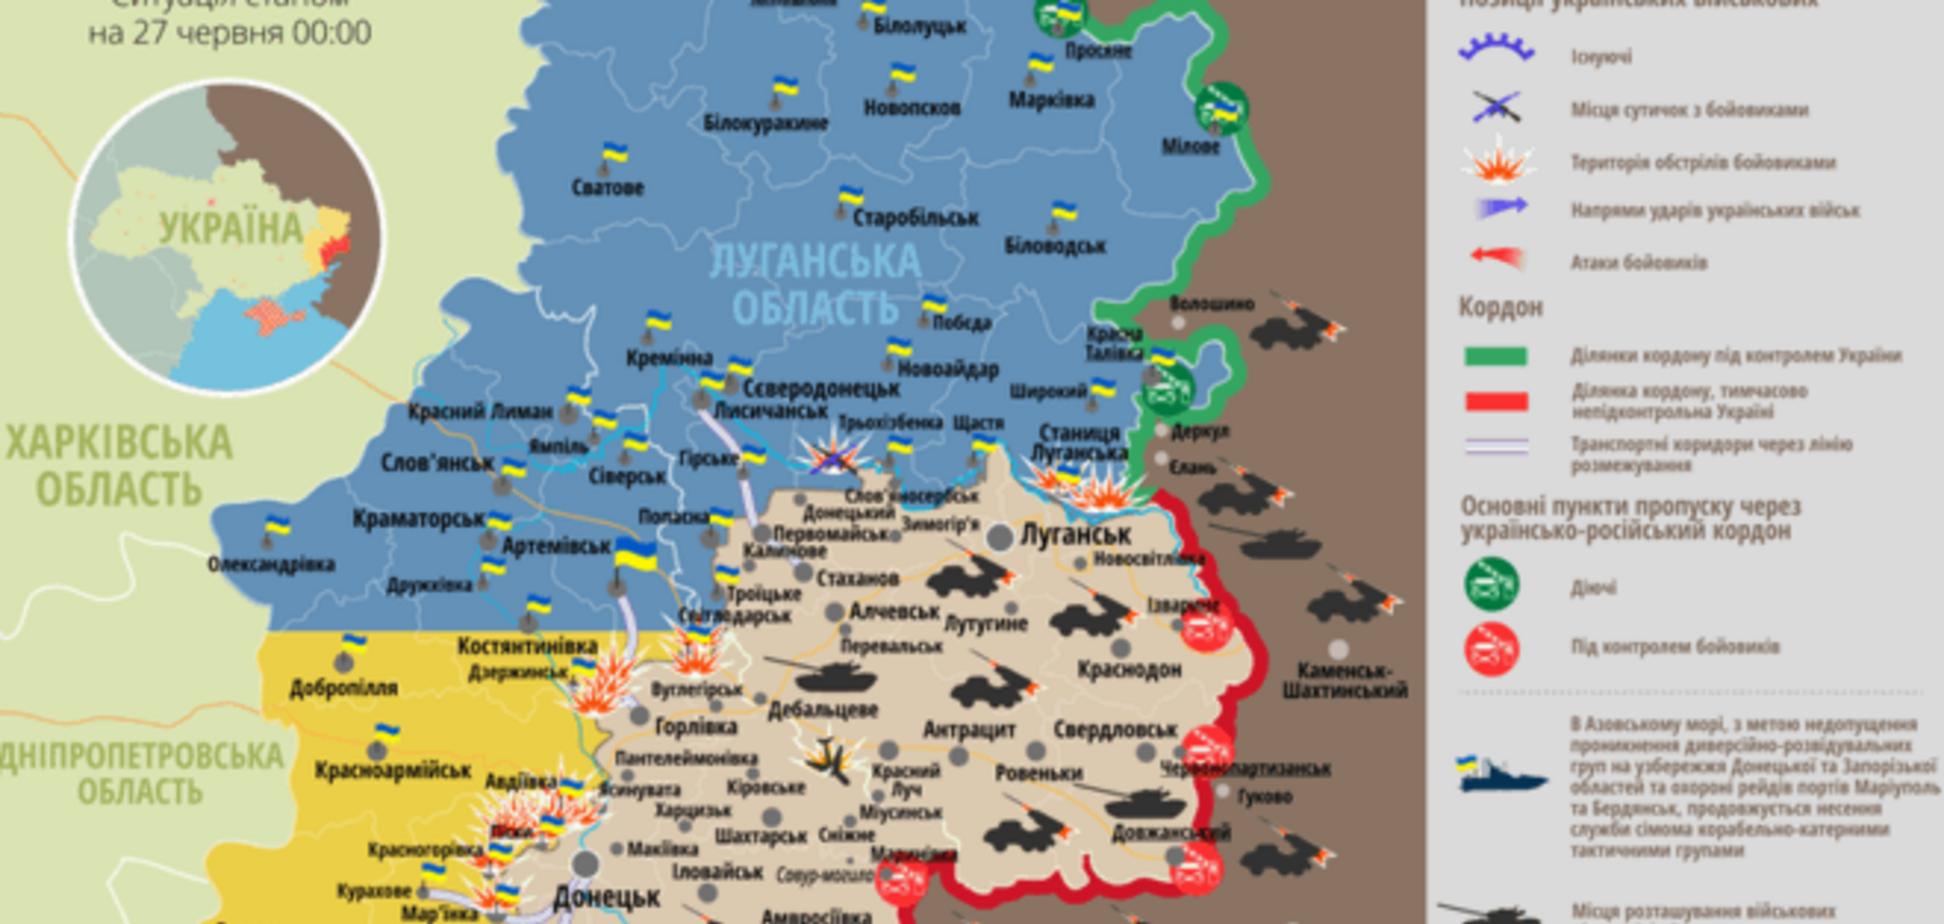 Опублікована актуальна карта АТО - 27 червня 2015